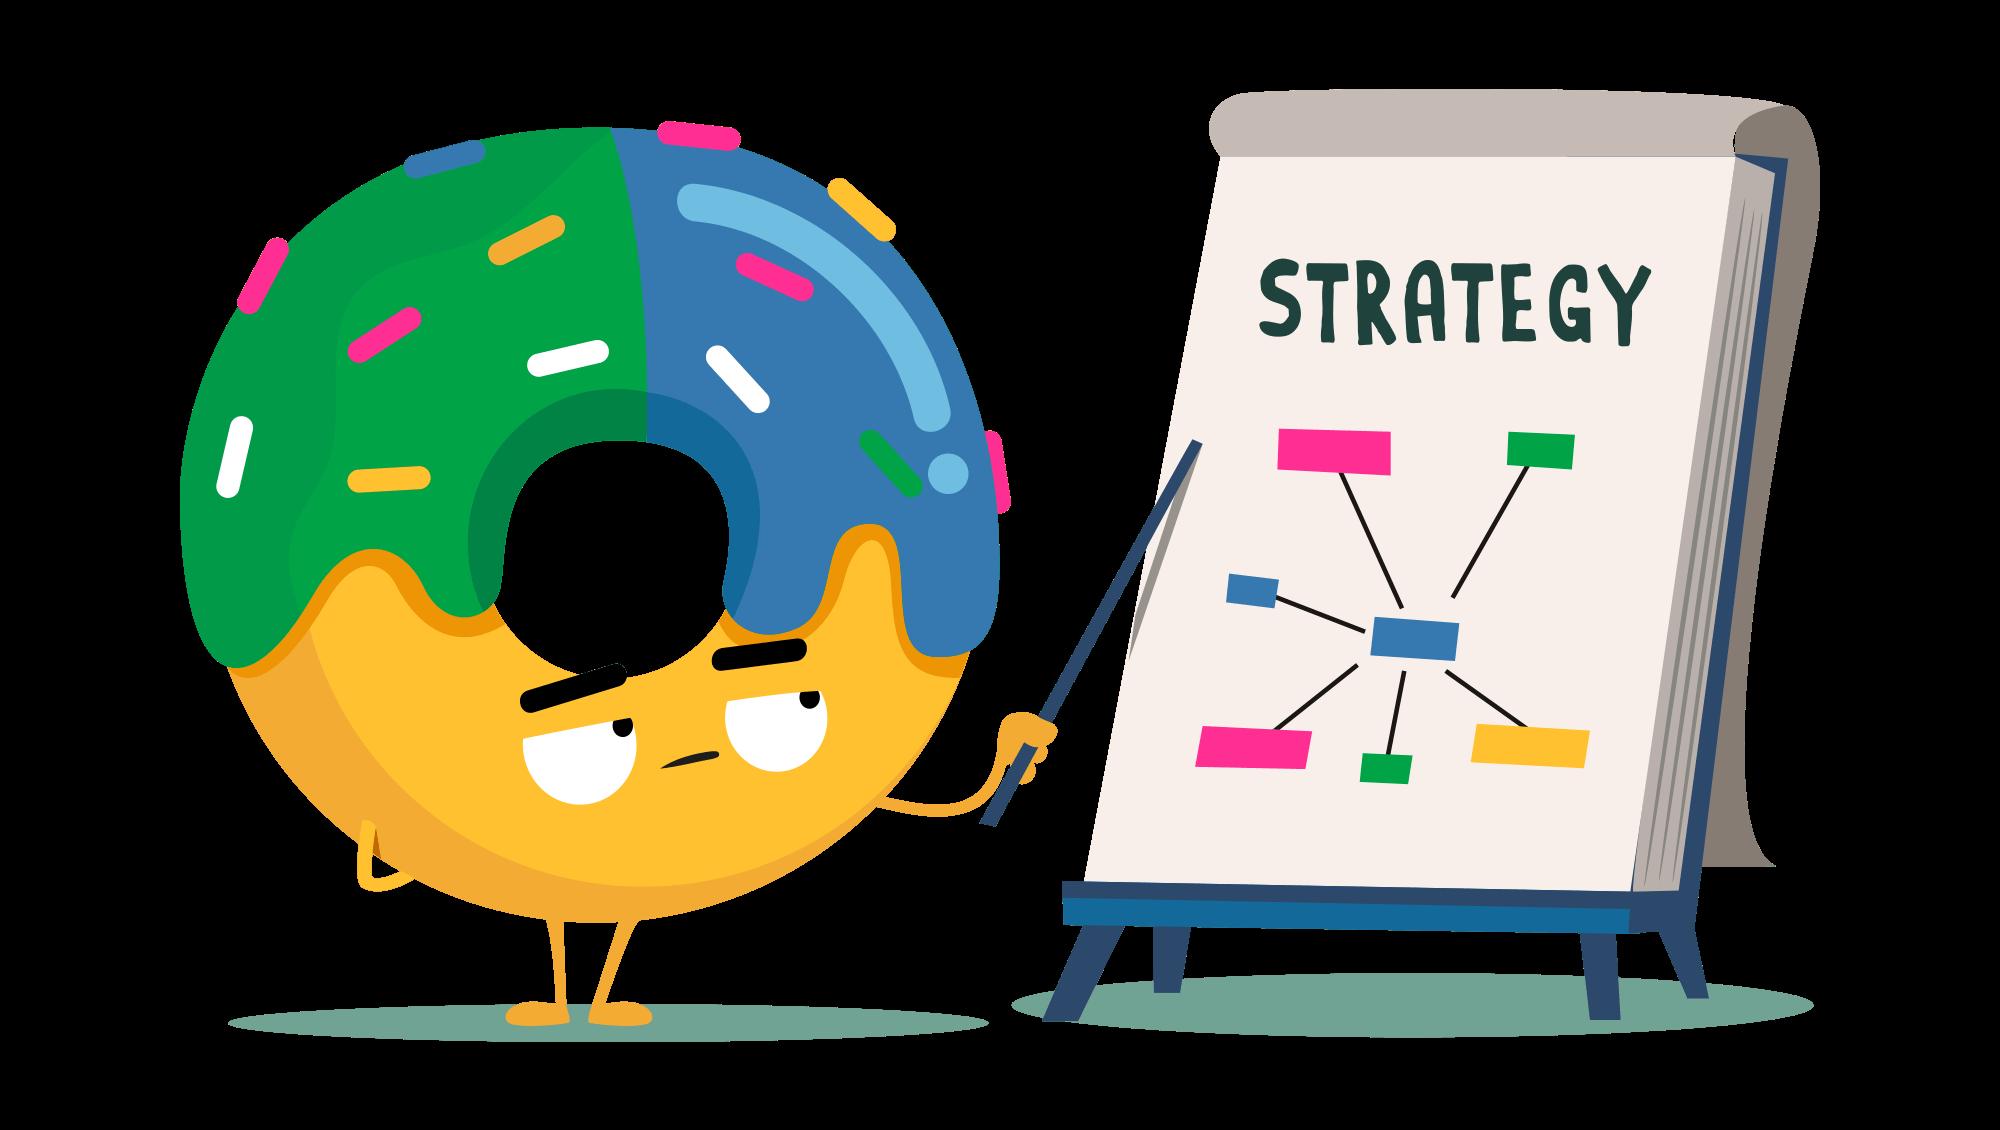 Stratégie digital marketing